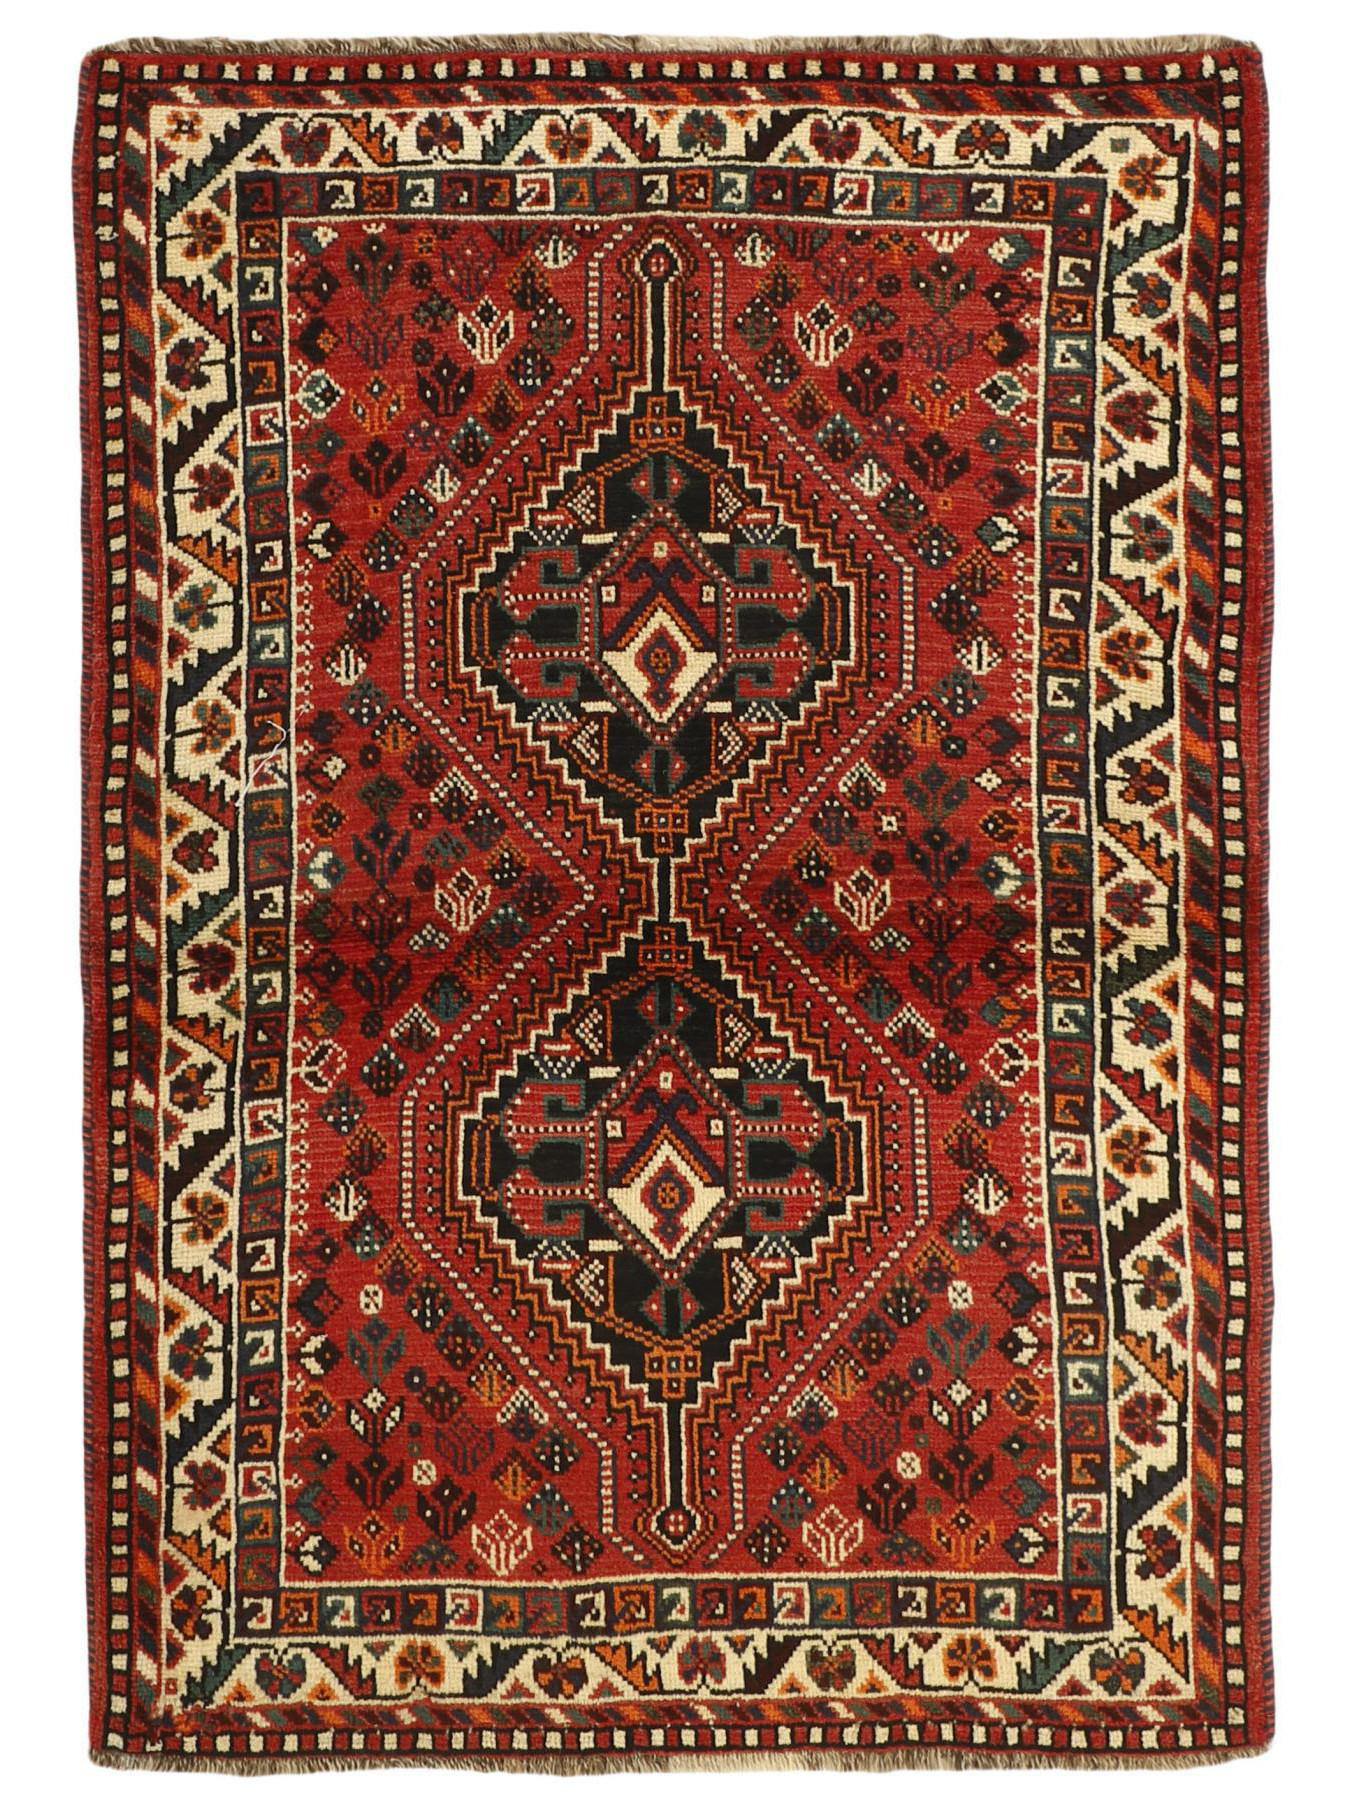 Perzische tapijten - Shiraz